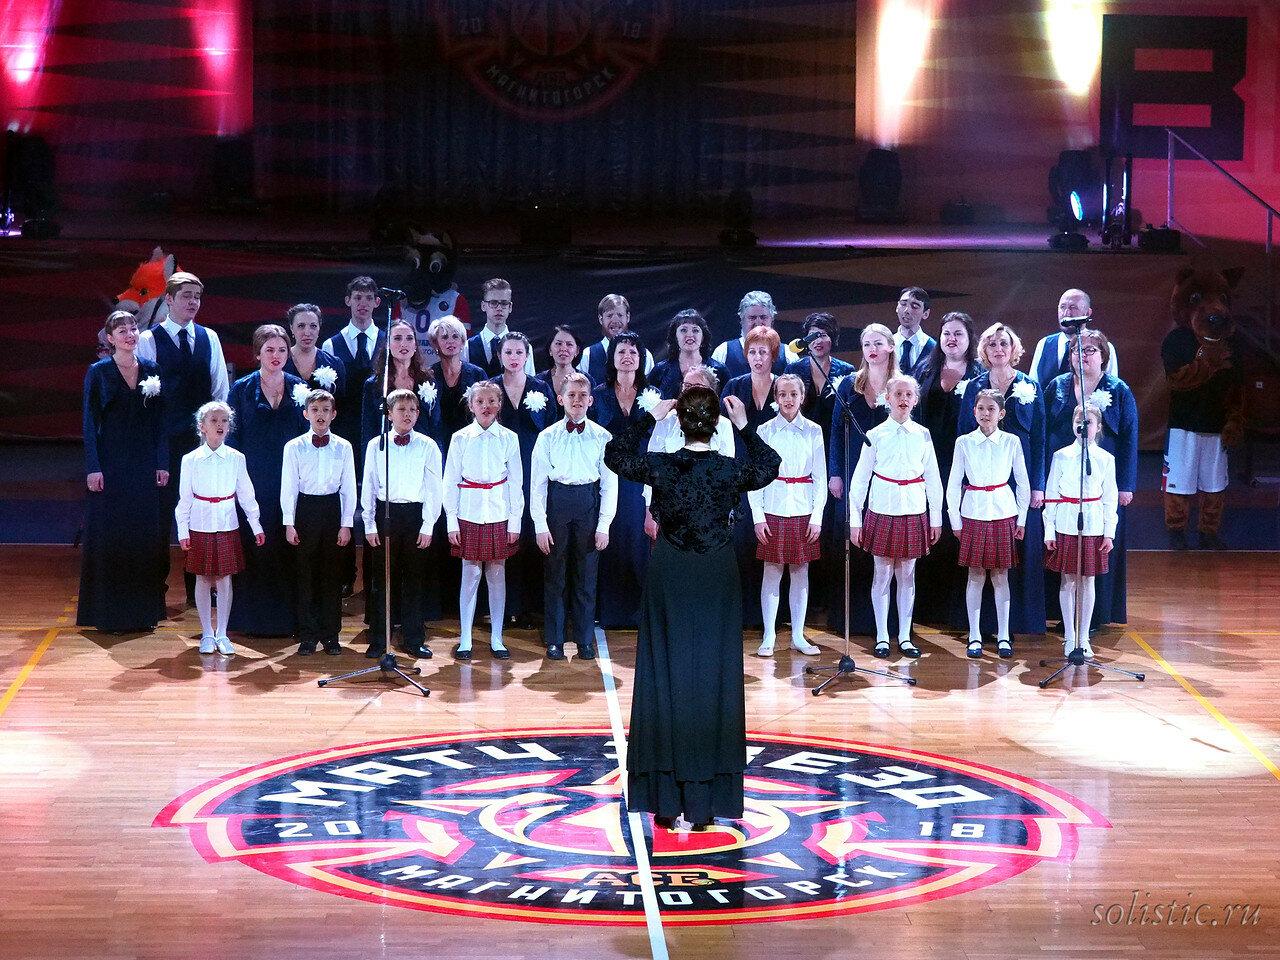 40 Матч звезд АСБ 2018 (ассоциации студенческого баскетбола)